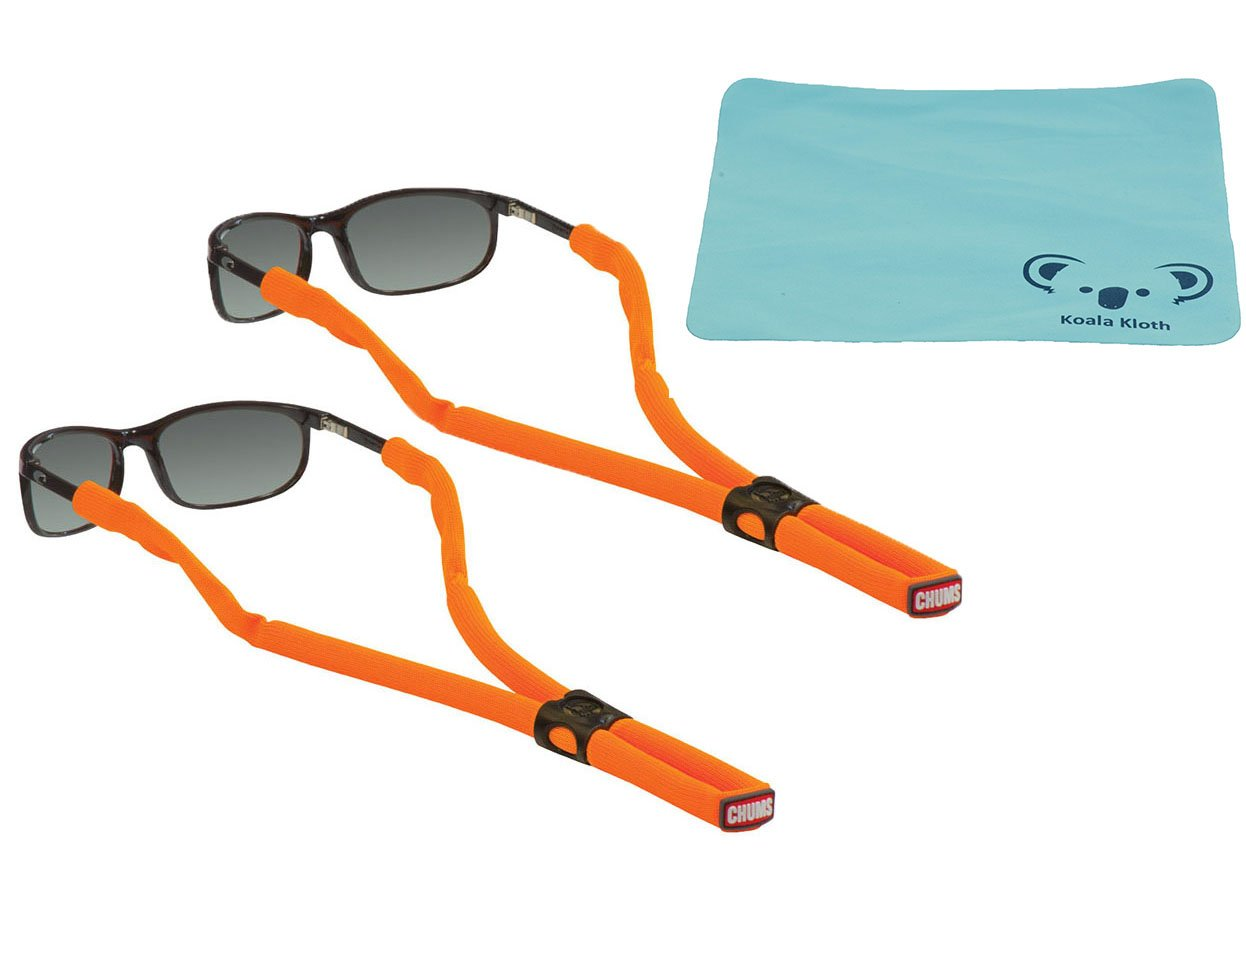 Koala Lifestyle Chums Classic Glassfloats Floating Eyewear Retainer Sunglass Strap | Eyeglass & Glasses Float | Water Sports Holder Keeper Lanyard | 2pk Bundle + Cloth, Neon Orange by Koala Lifestyle